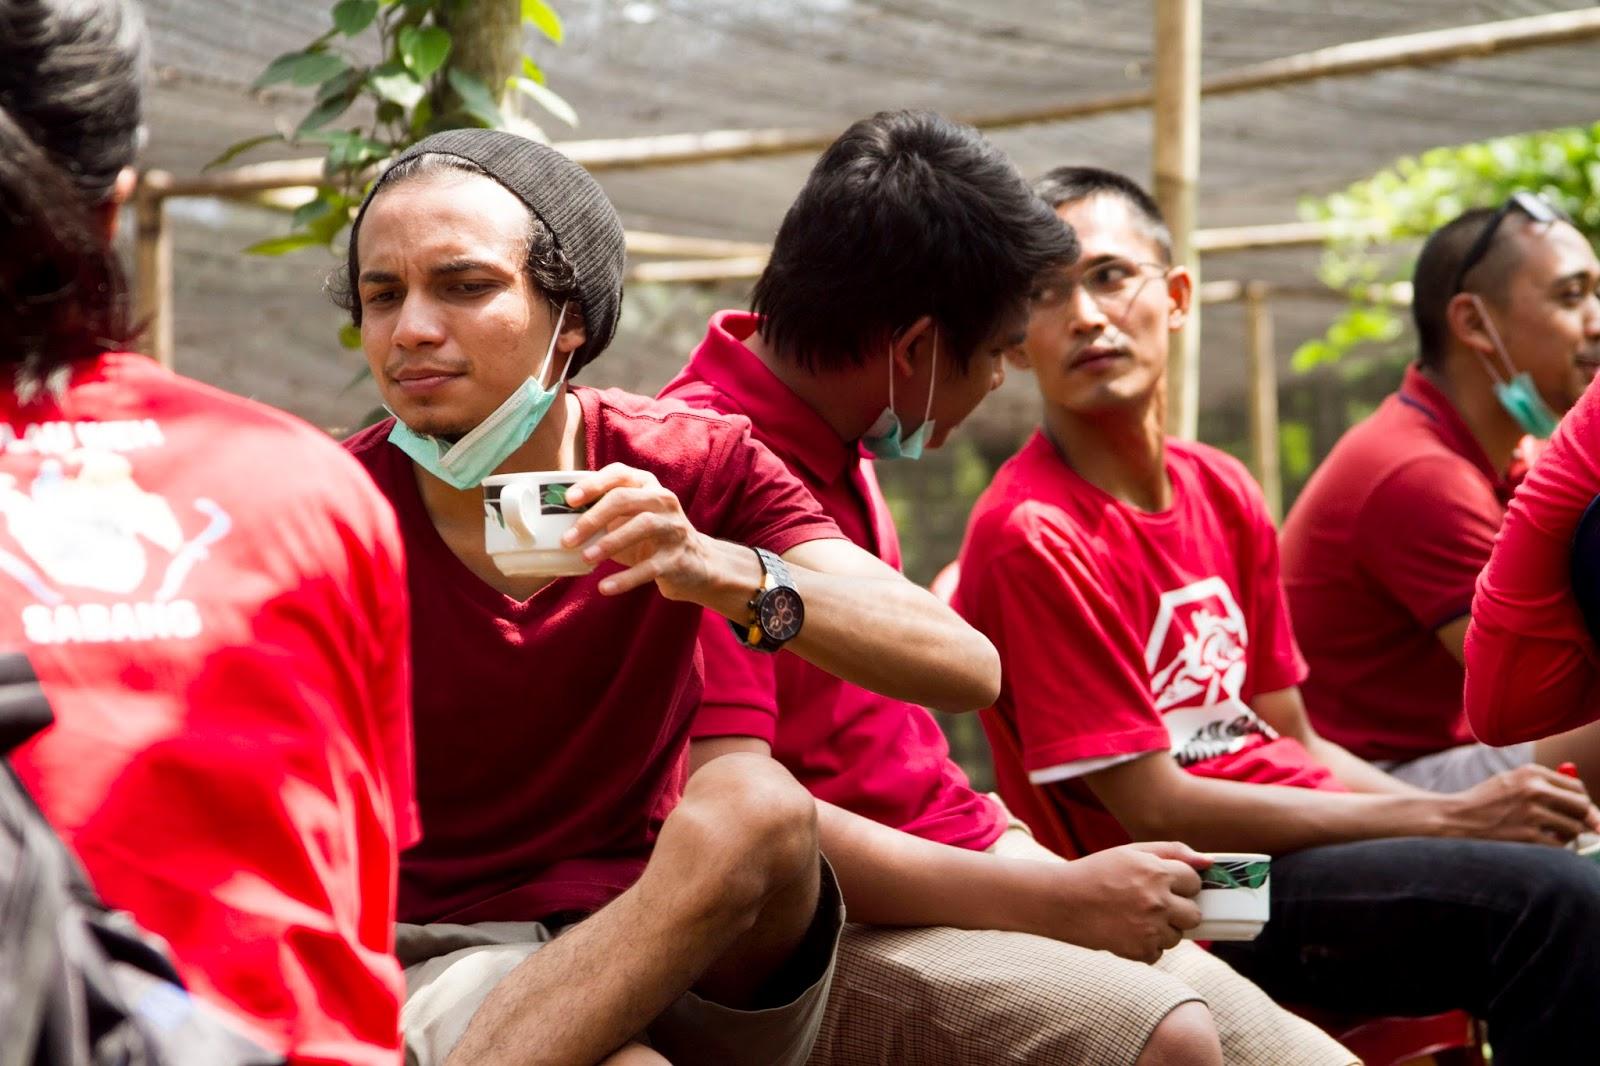 Miracle In Lampung Coffe Nescafe Plan Pajang Factory Kopi Robusta By Yoen Iskan Akumandiri Ngopi Di Tengah Kebun